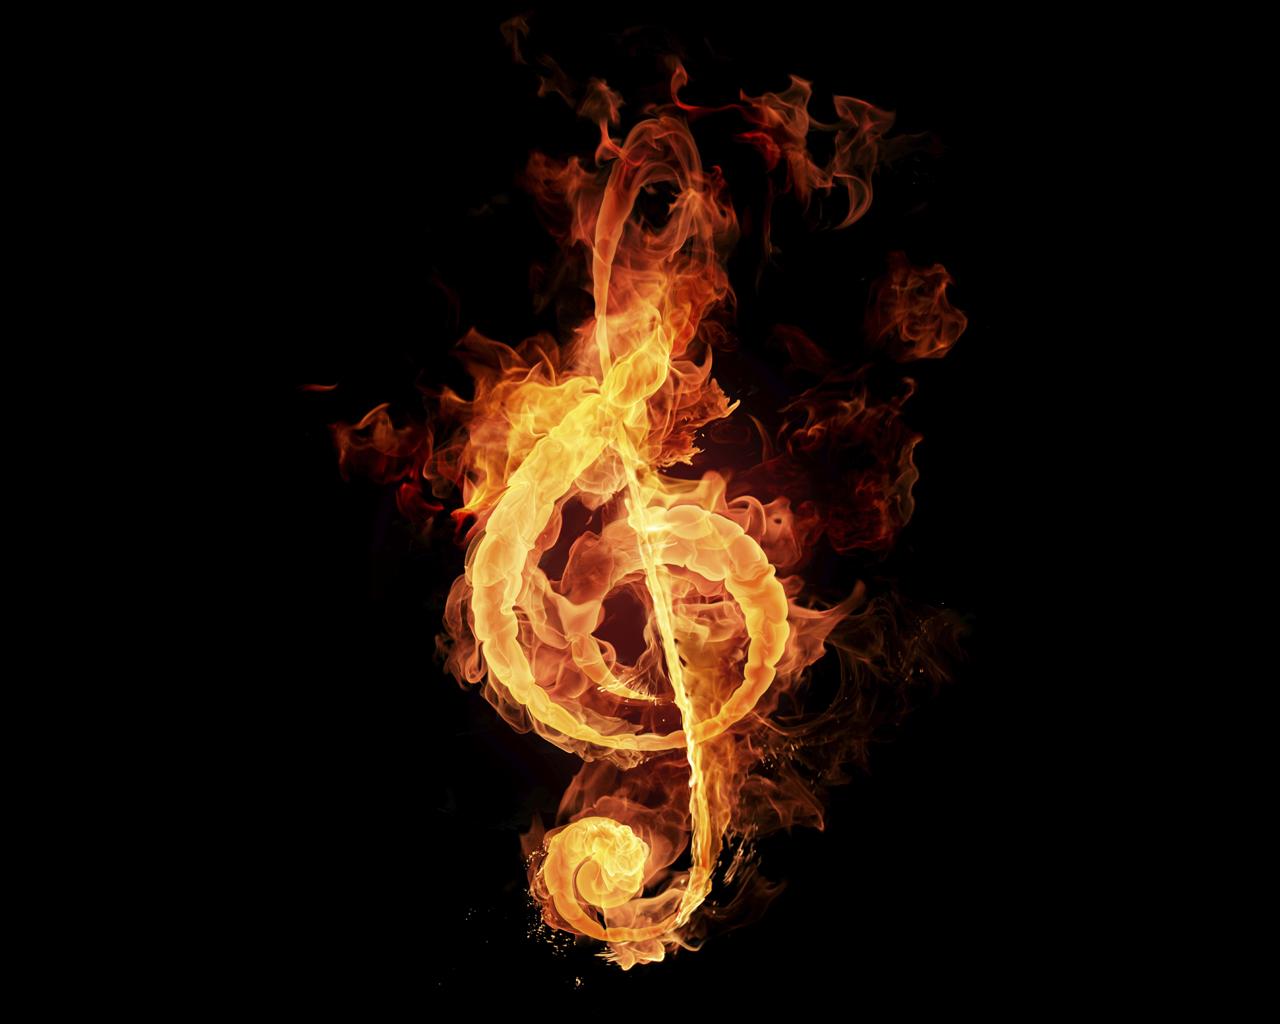 http://1.bp.blogspot.com/_1Dv2ZNVQlGQ/TNED3gftCcI/AAAAAAAAAHQ/Y9U3tVAd8CM/s1600/Funny_wallpapers_Creative_Wallpaper_Fire_violin_key_013656_.jpg